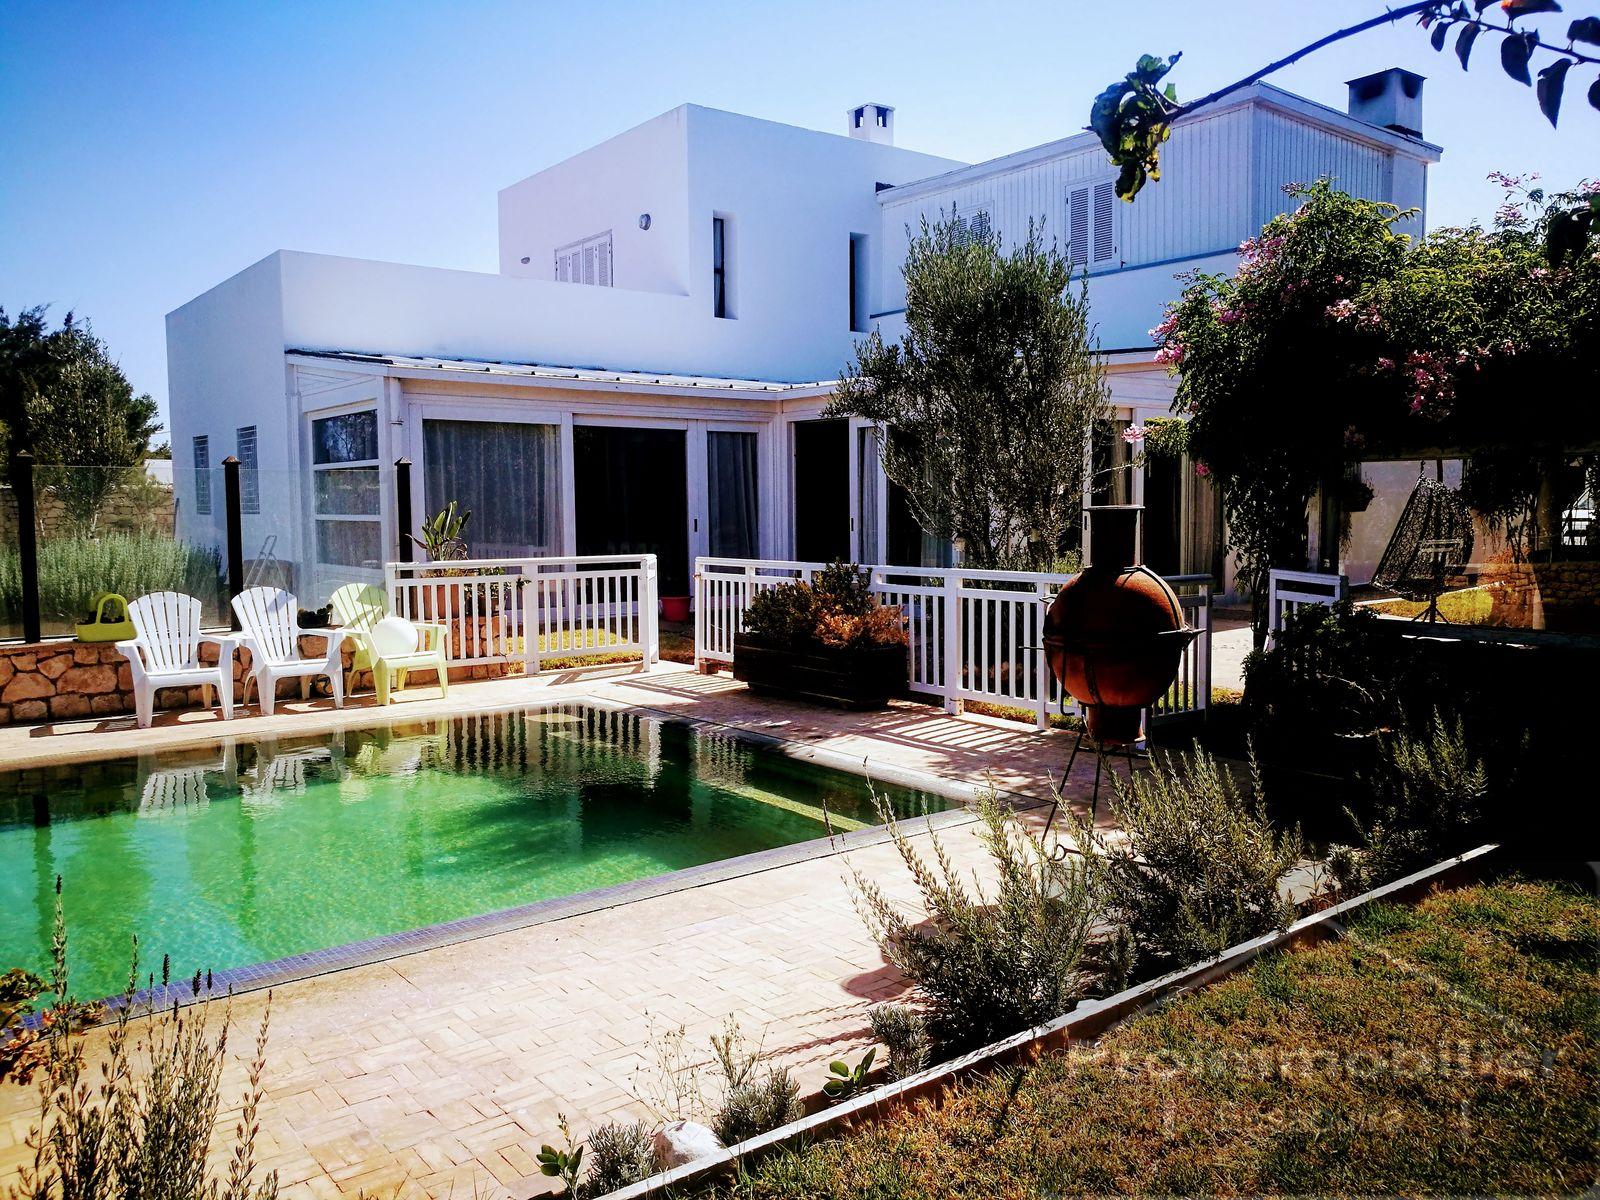 19-07-02-VV  Beautiful Villa 200 m² Garden 1500m²